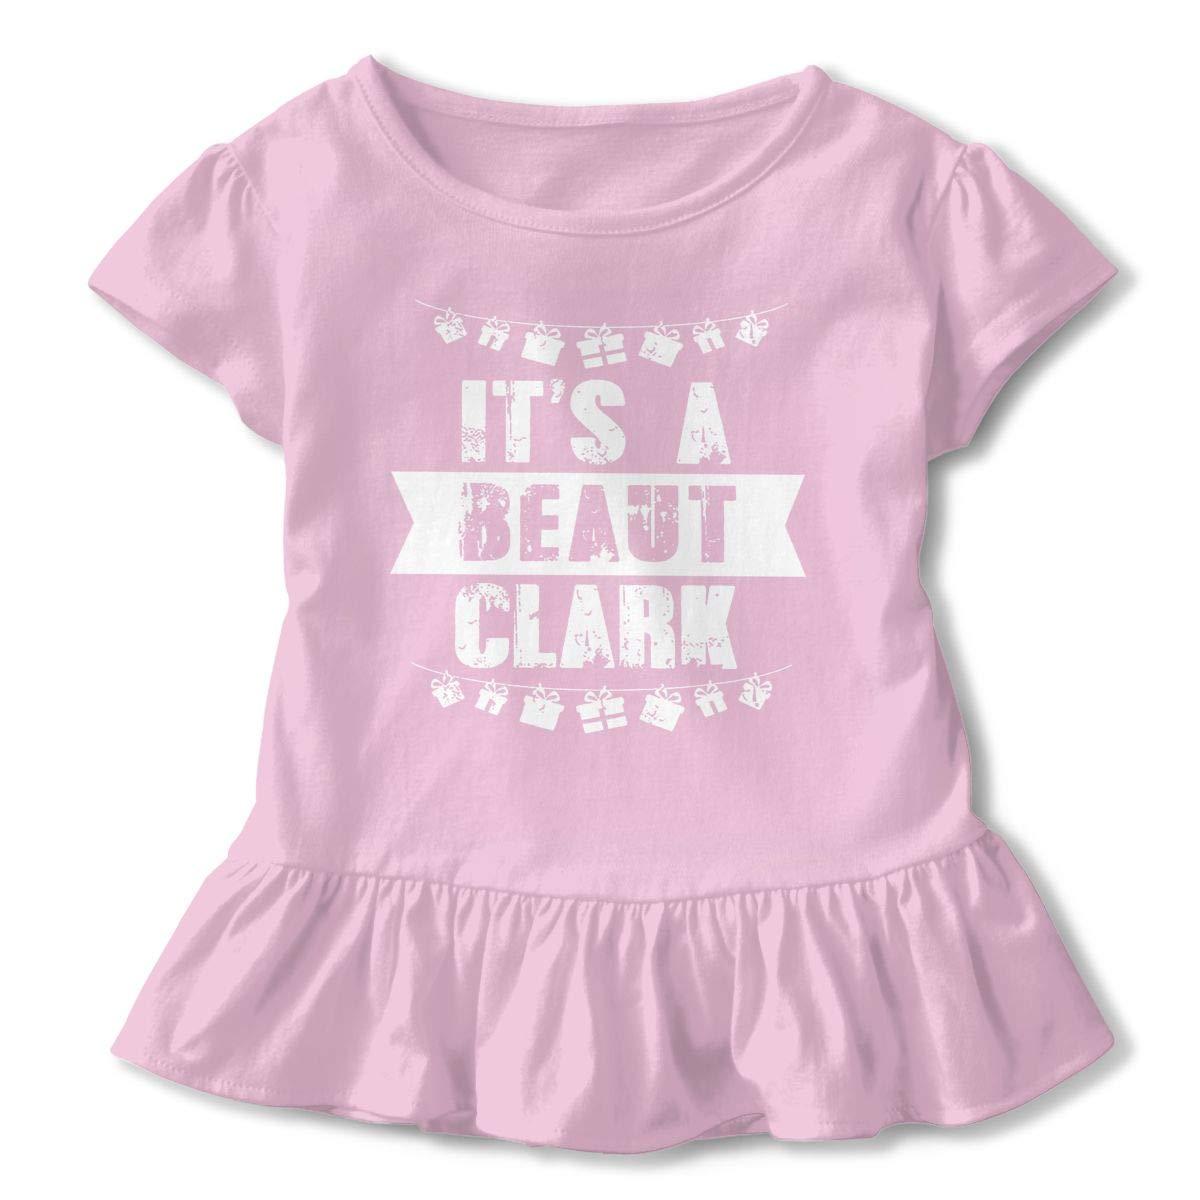 Beaut Clark Christmas Cute Toddler Kids Girls Short Sleeves Shirts Ruffles for Daily Wear Party School